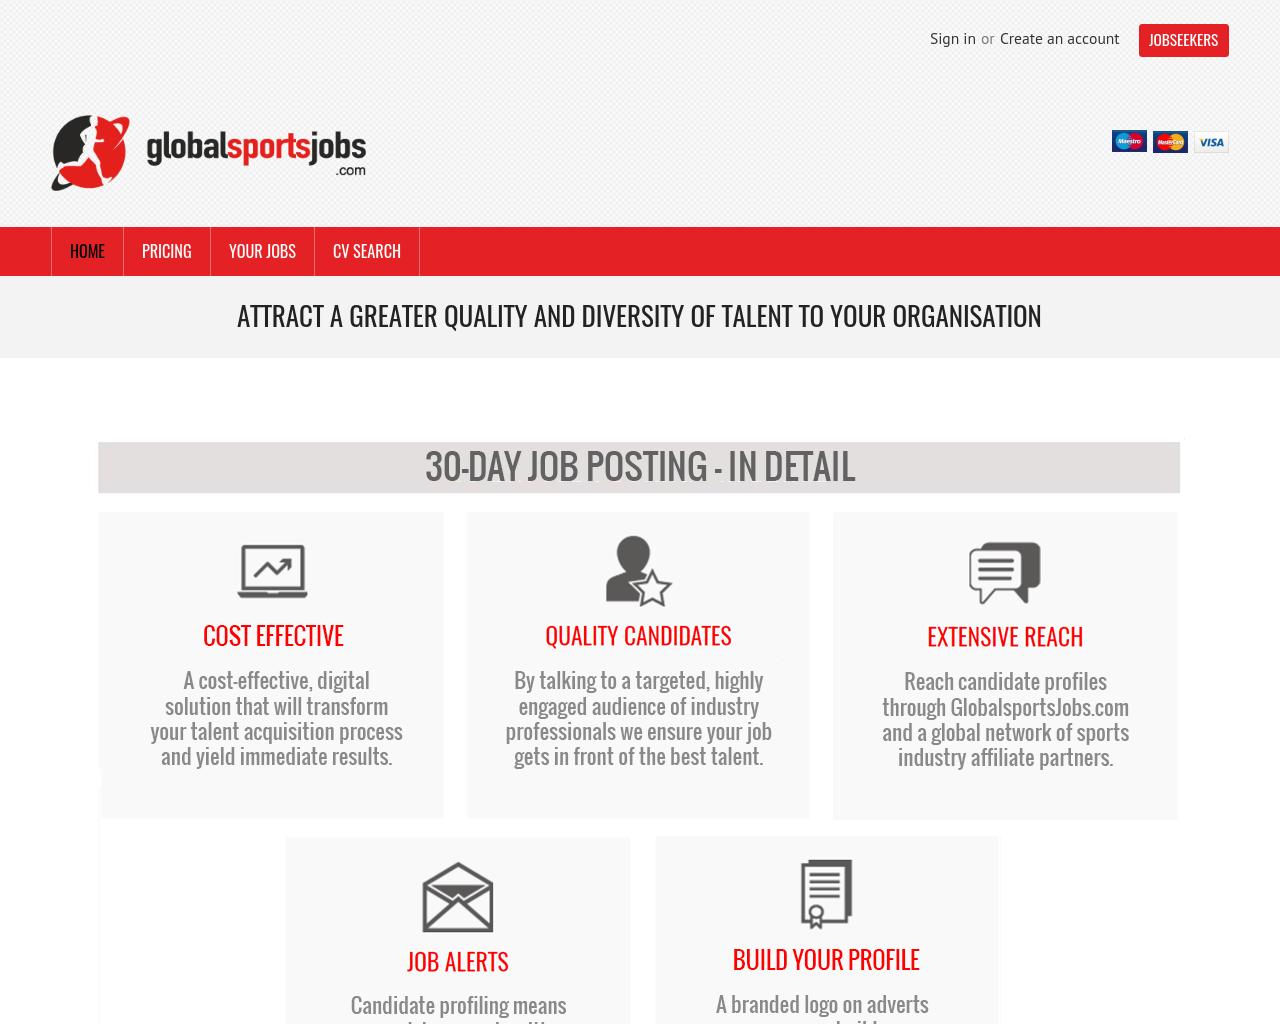 GlobalSportsJobs.com-Advertising-Reviews-Pricing